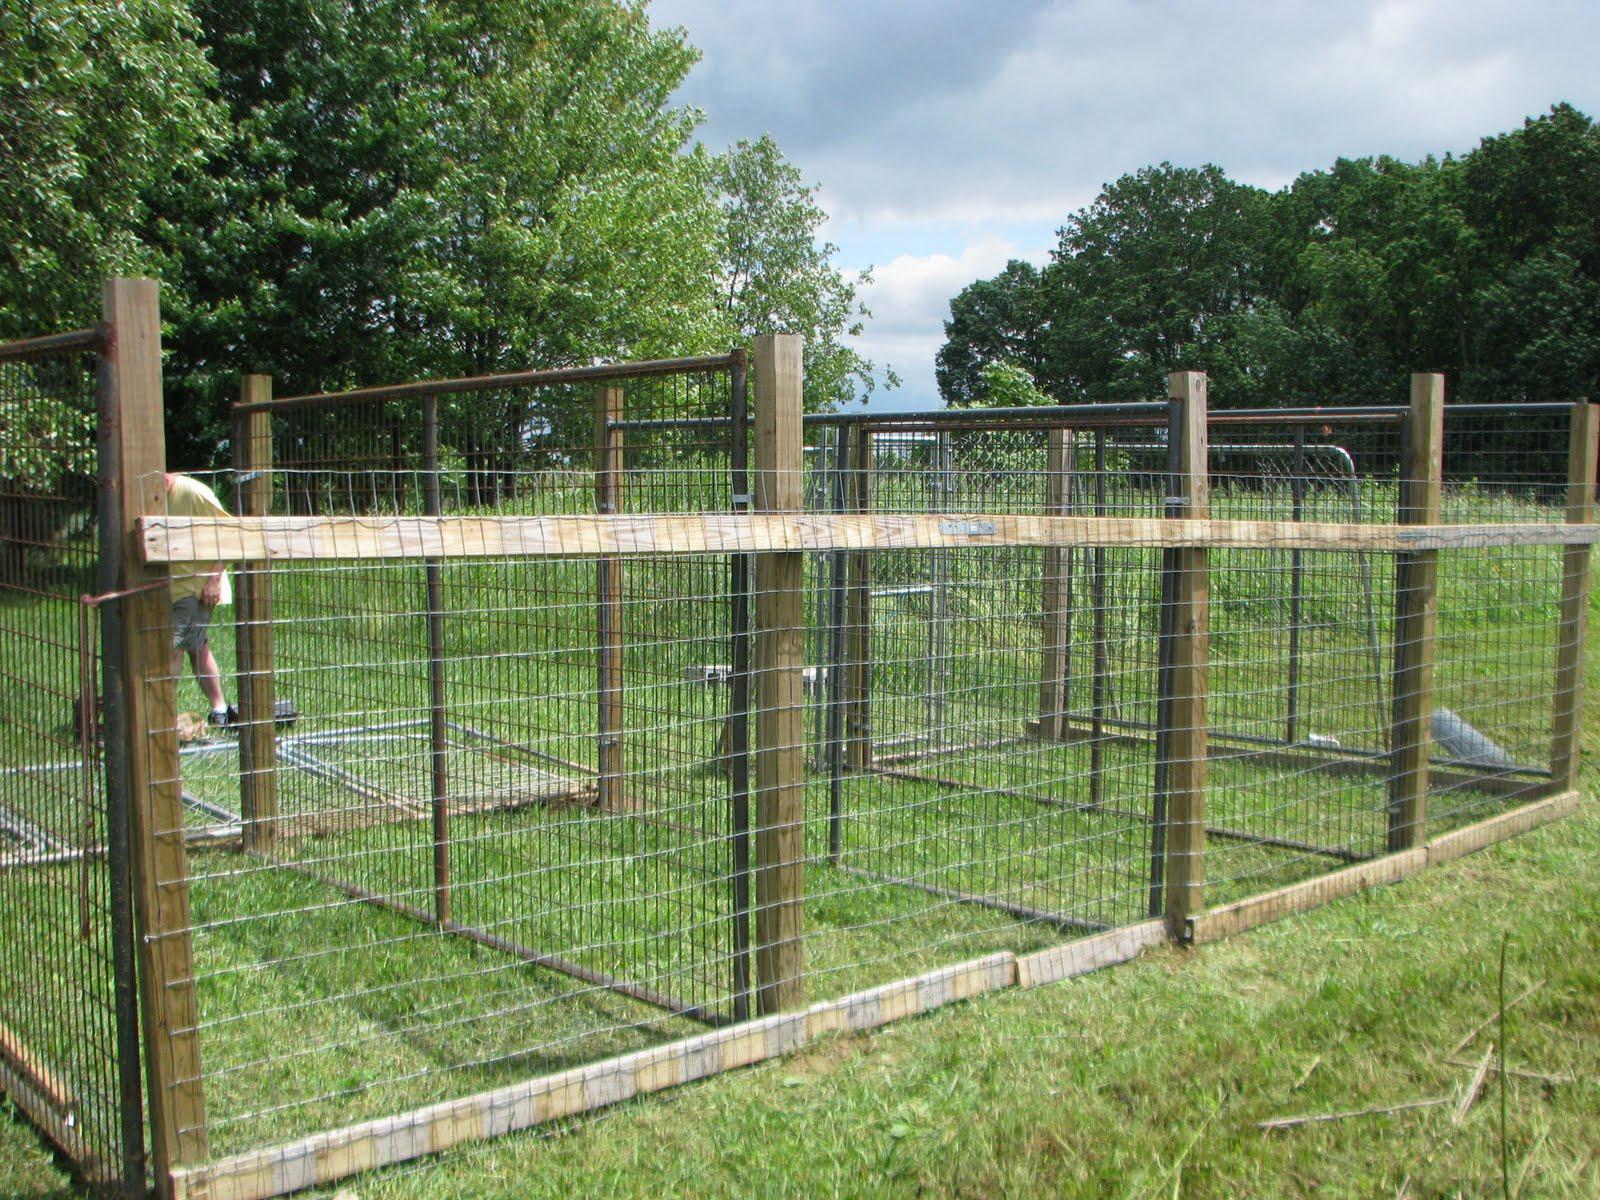 outdoor dog kennel flooring ideas | rumahblog wallpaper